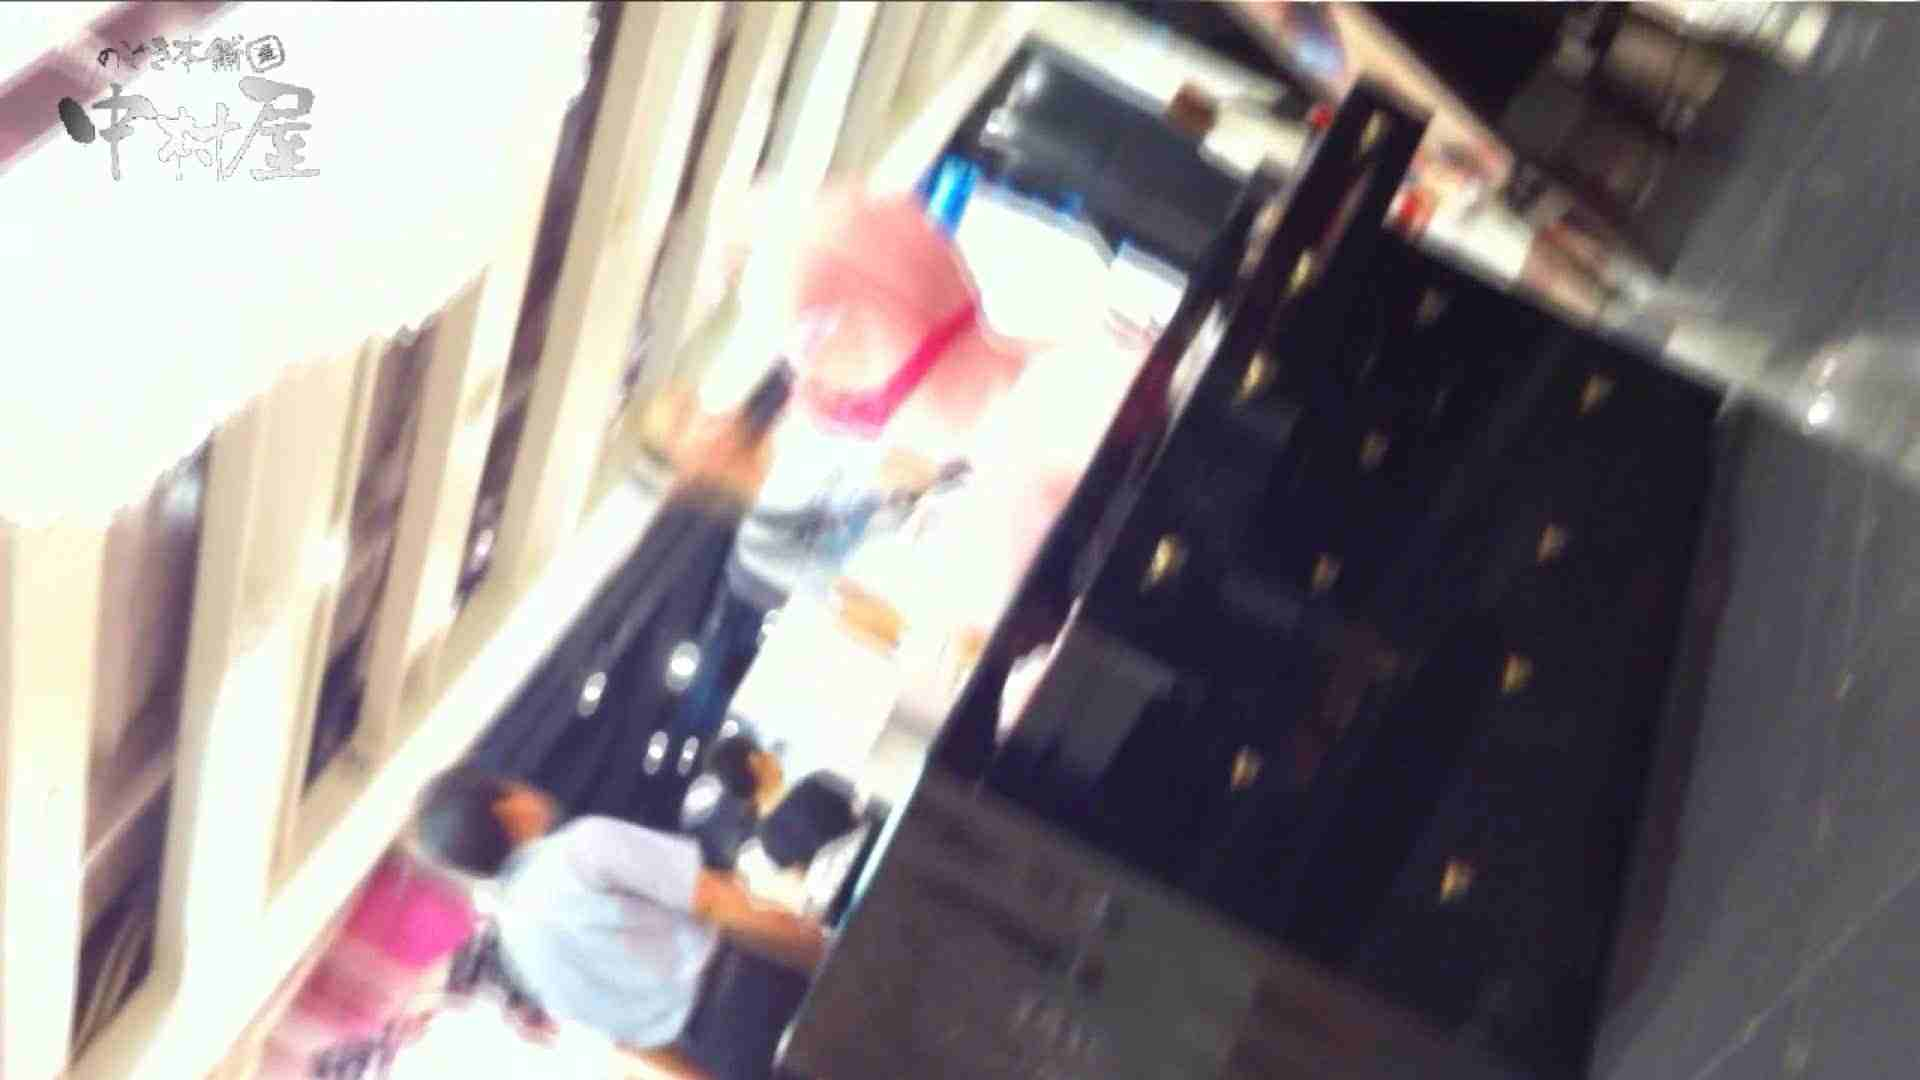 vol.47 カリスマ店員胸チラ&パンチラ 黒パン店員さん パンチラ 盗み撮り動画 39連発 11